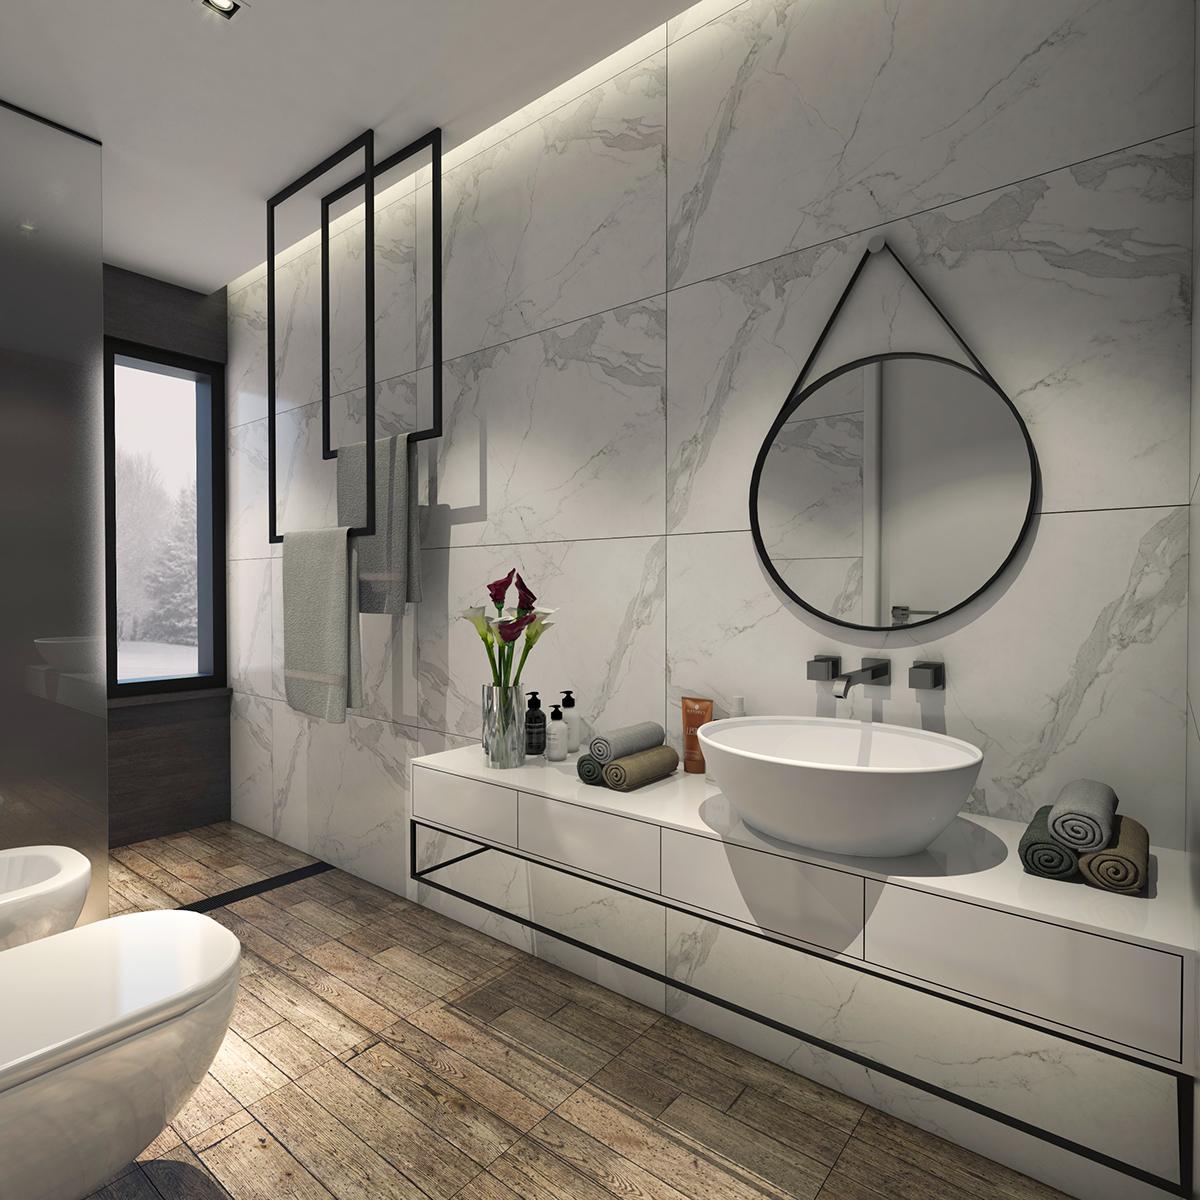 BATHROOM DESIGN /3/ /VRAY TRAINING/ on Behance on Model Toilet Design  id=27940